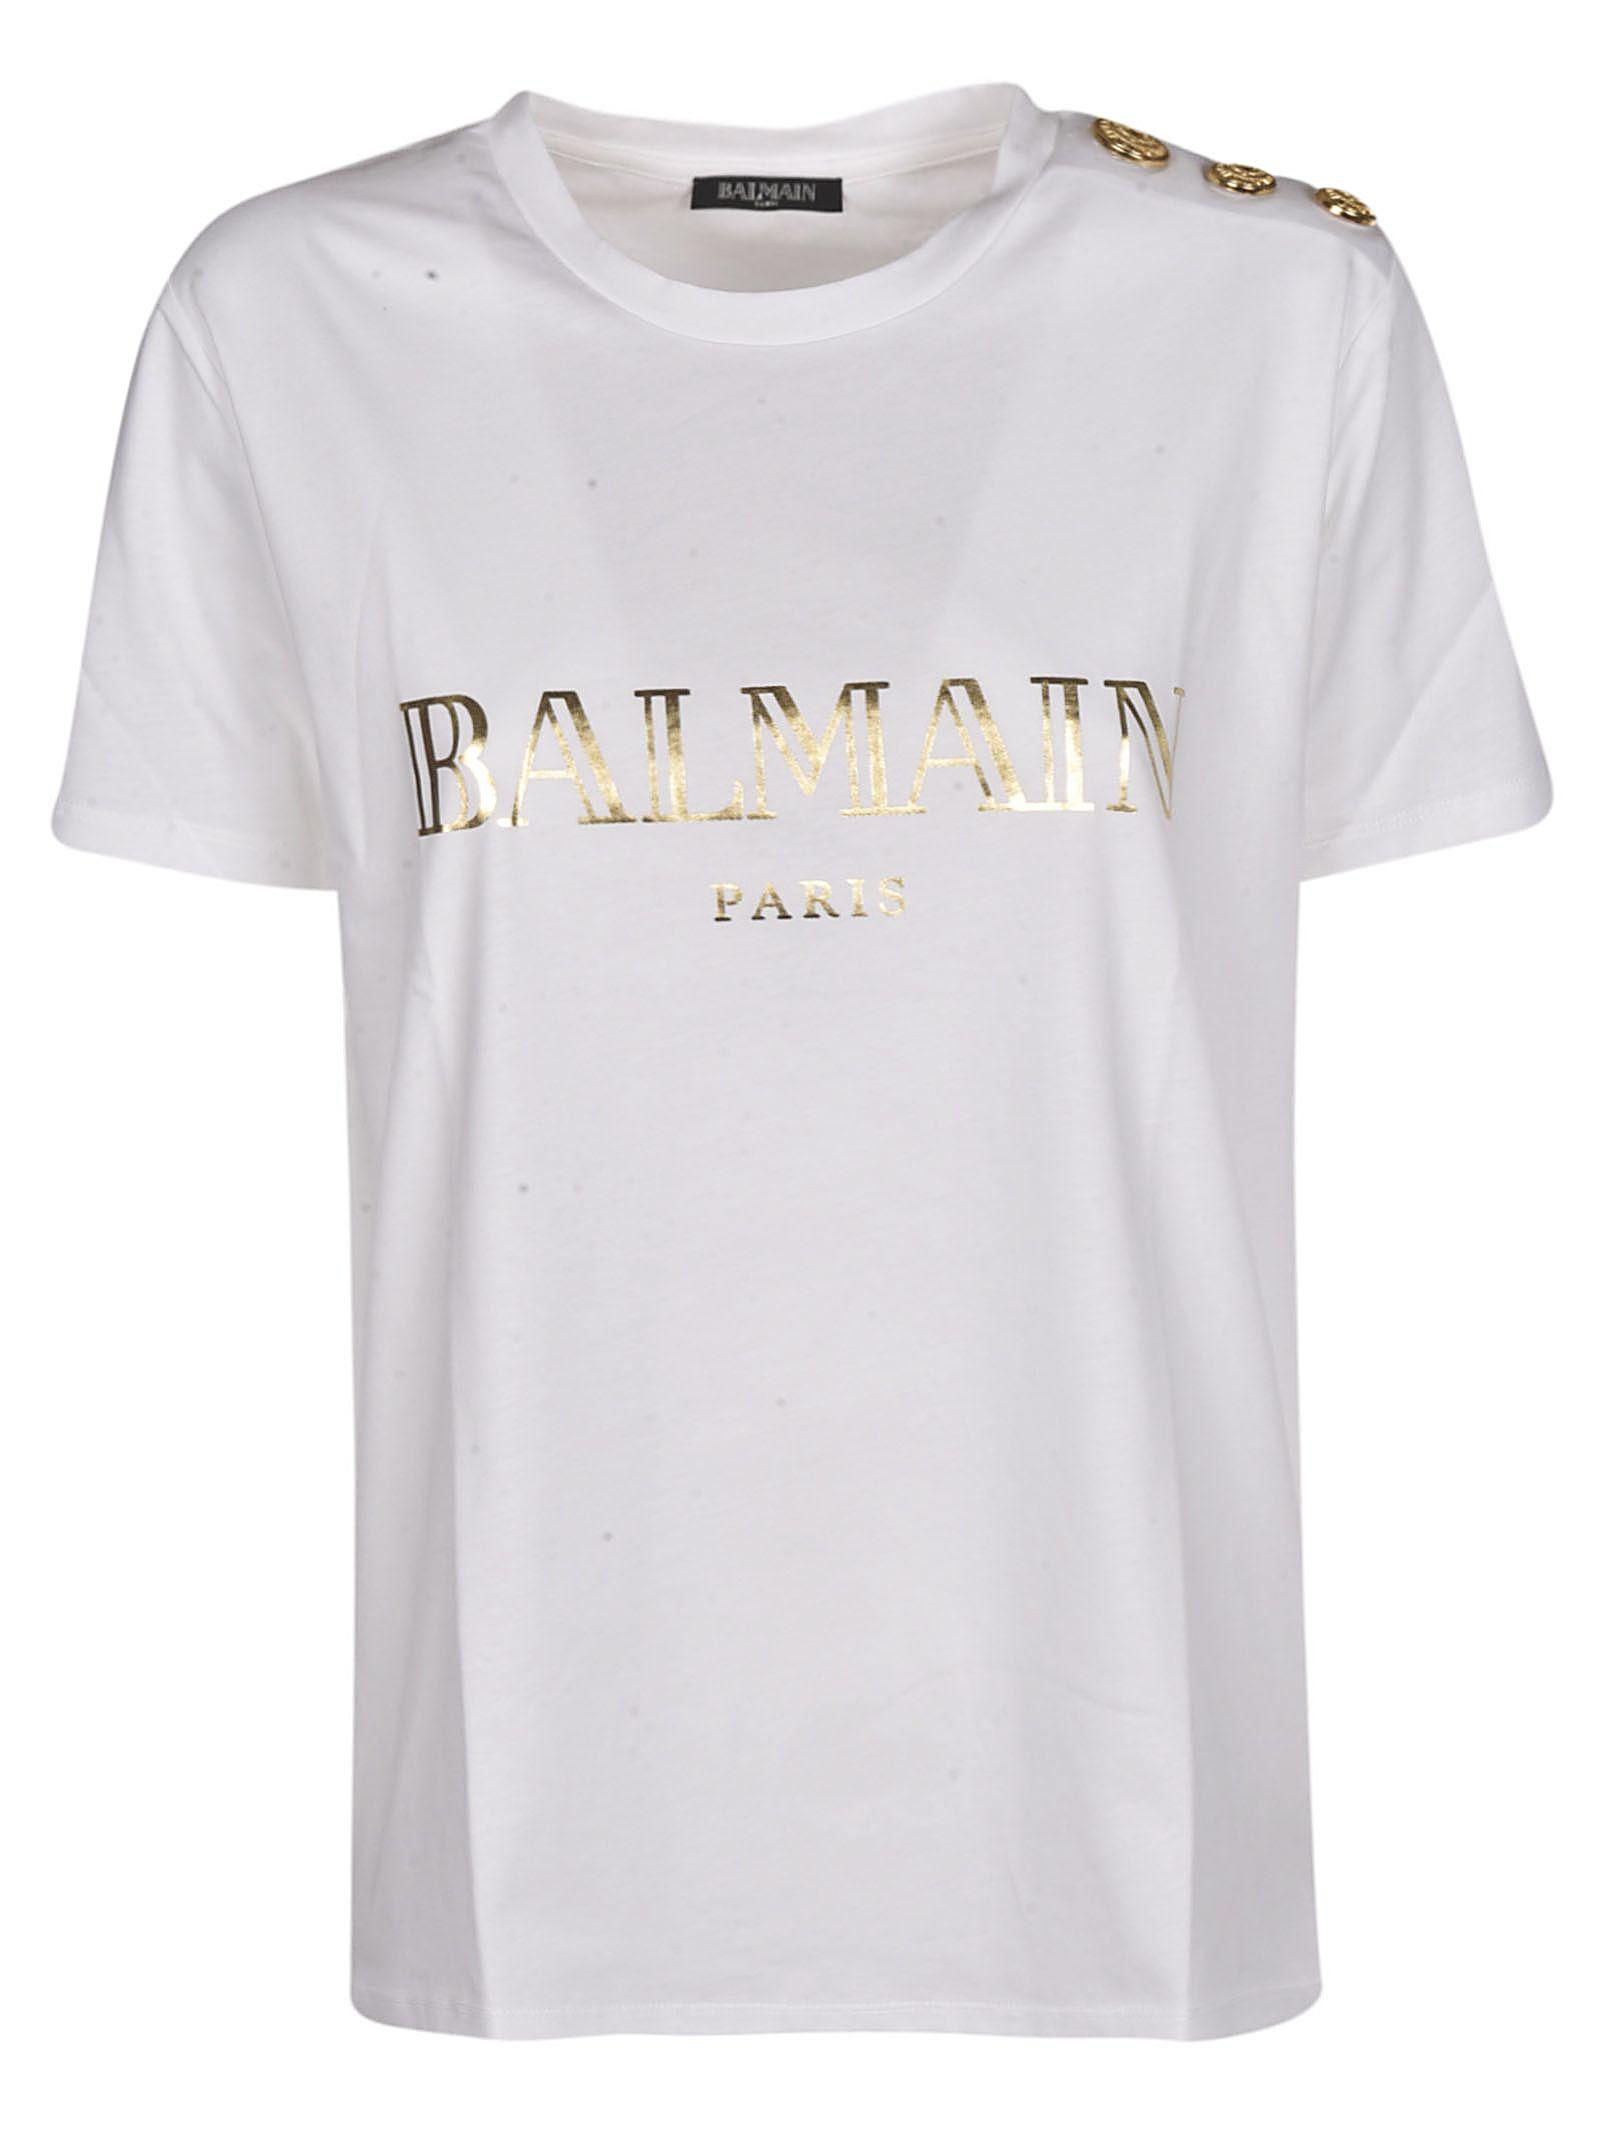 974ac80b4 Balmain Balmain Logo T-shirt - White - 10817625 | italist